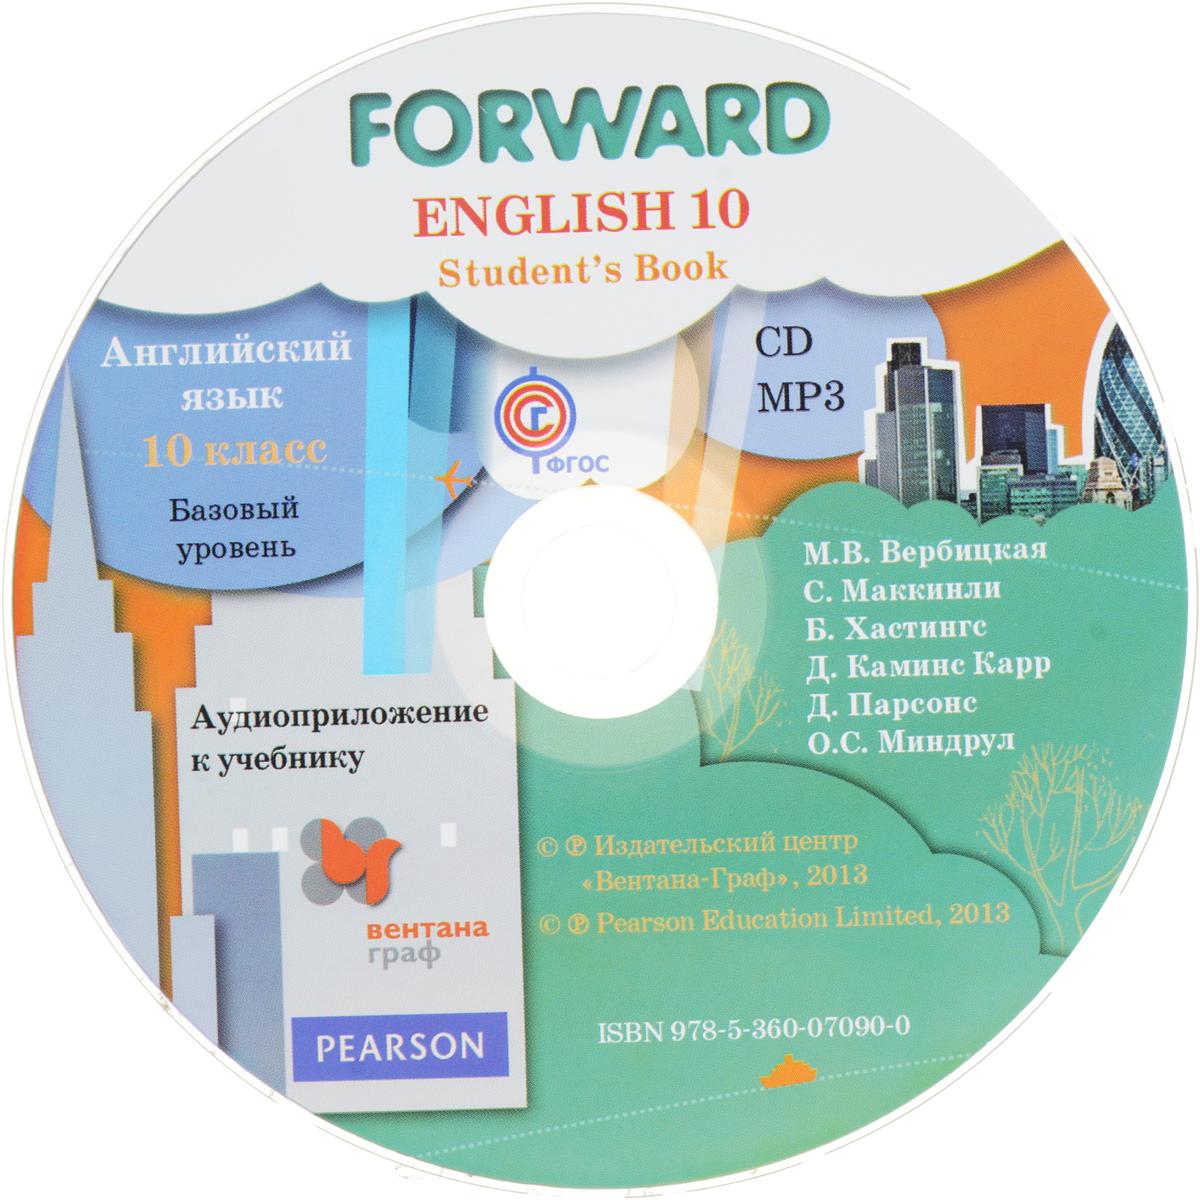 Forward English 10: Student's Book / Английский язык.10 класс. Учебник (+ CD)